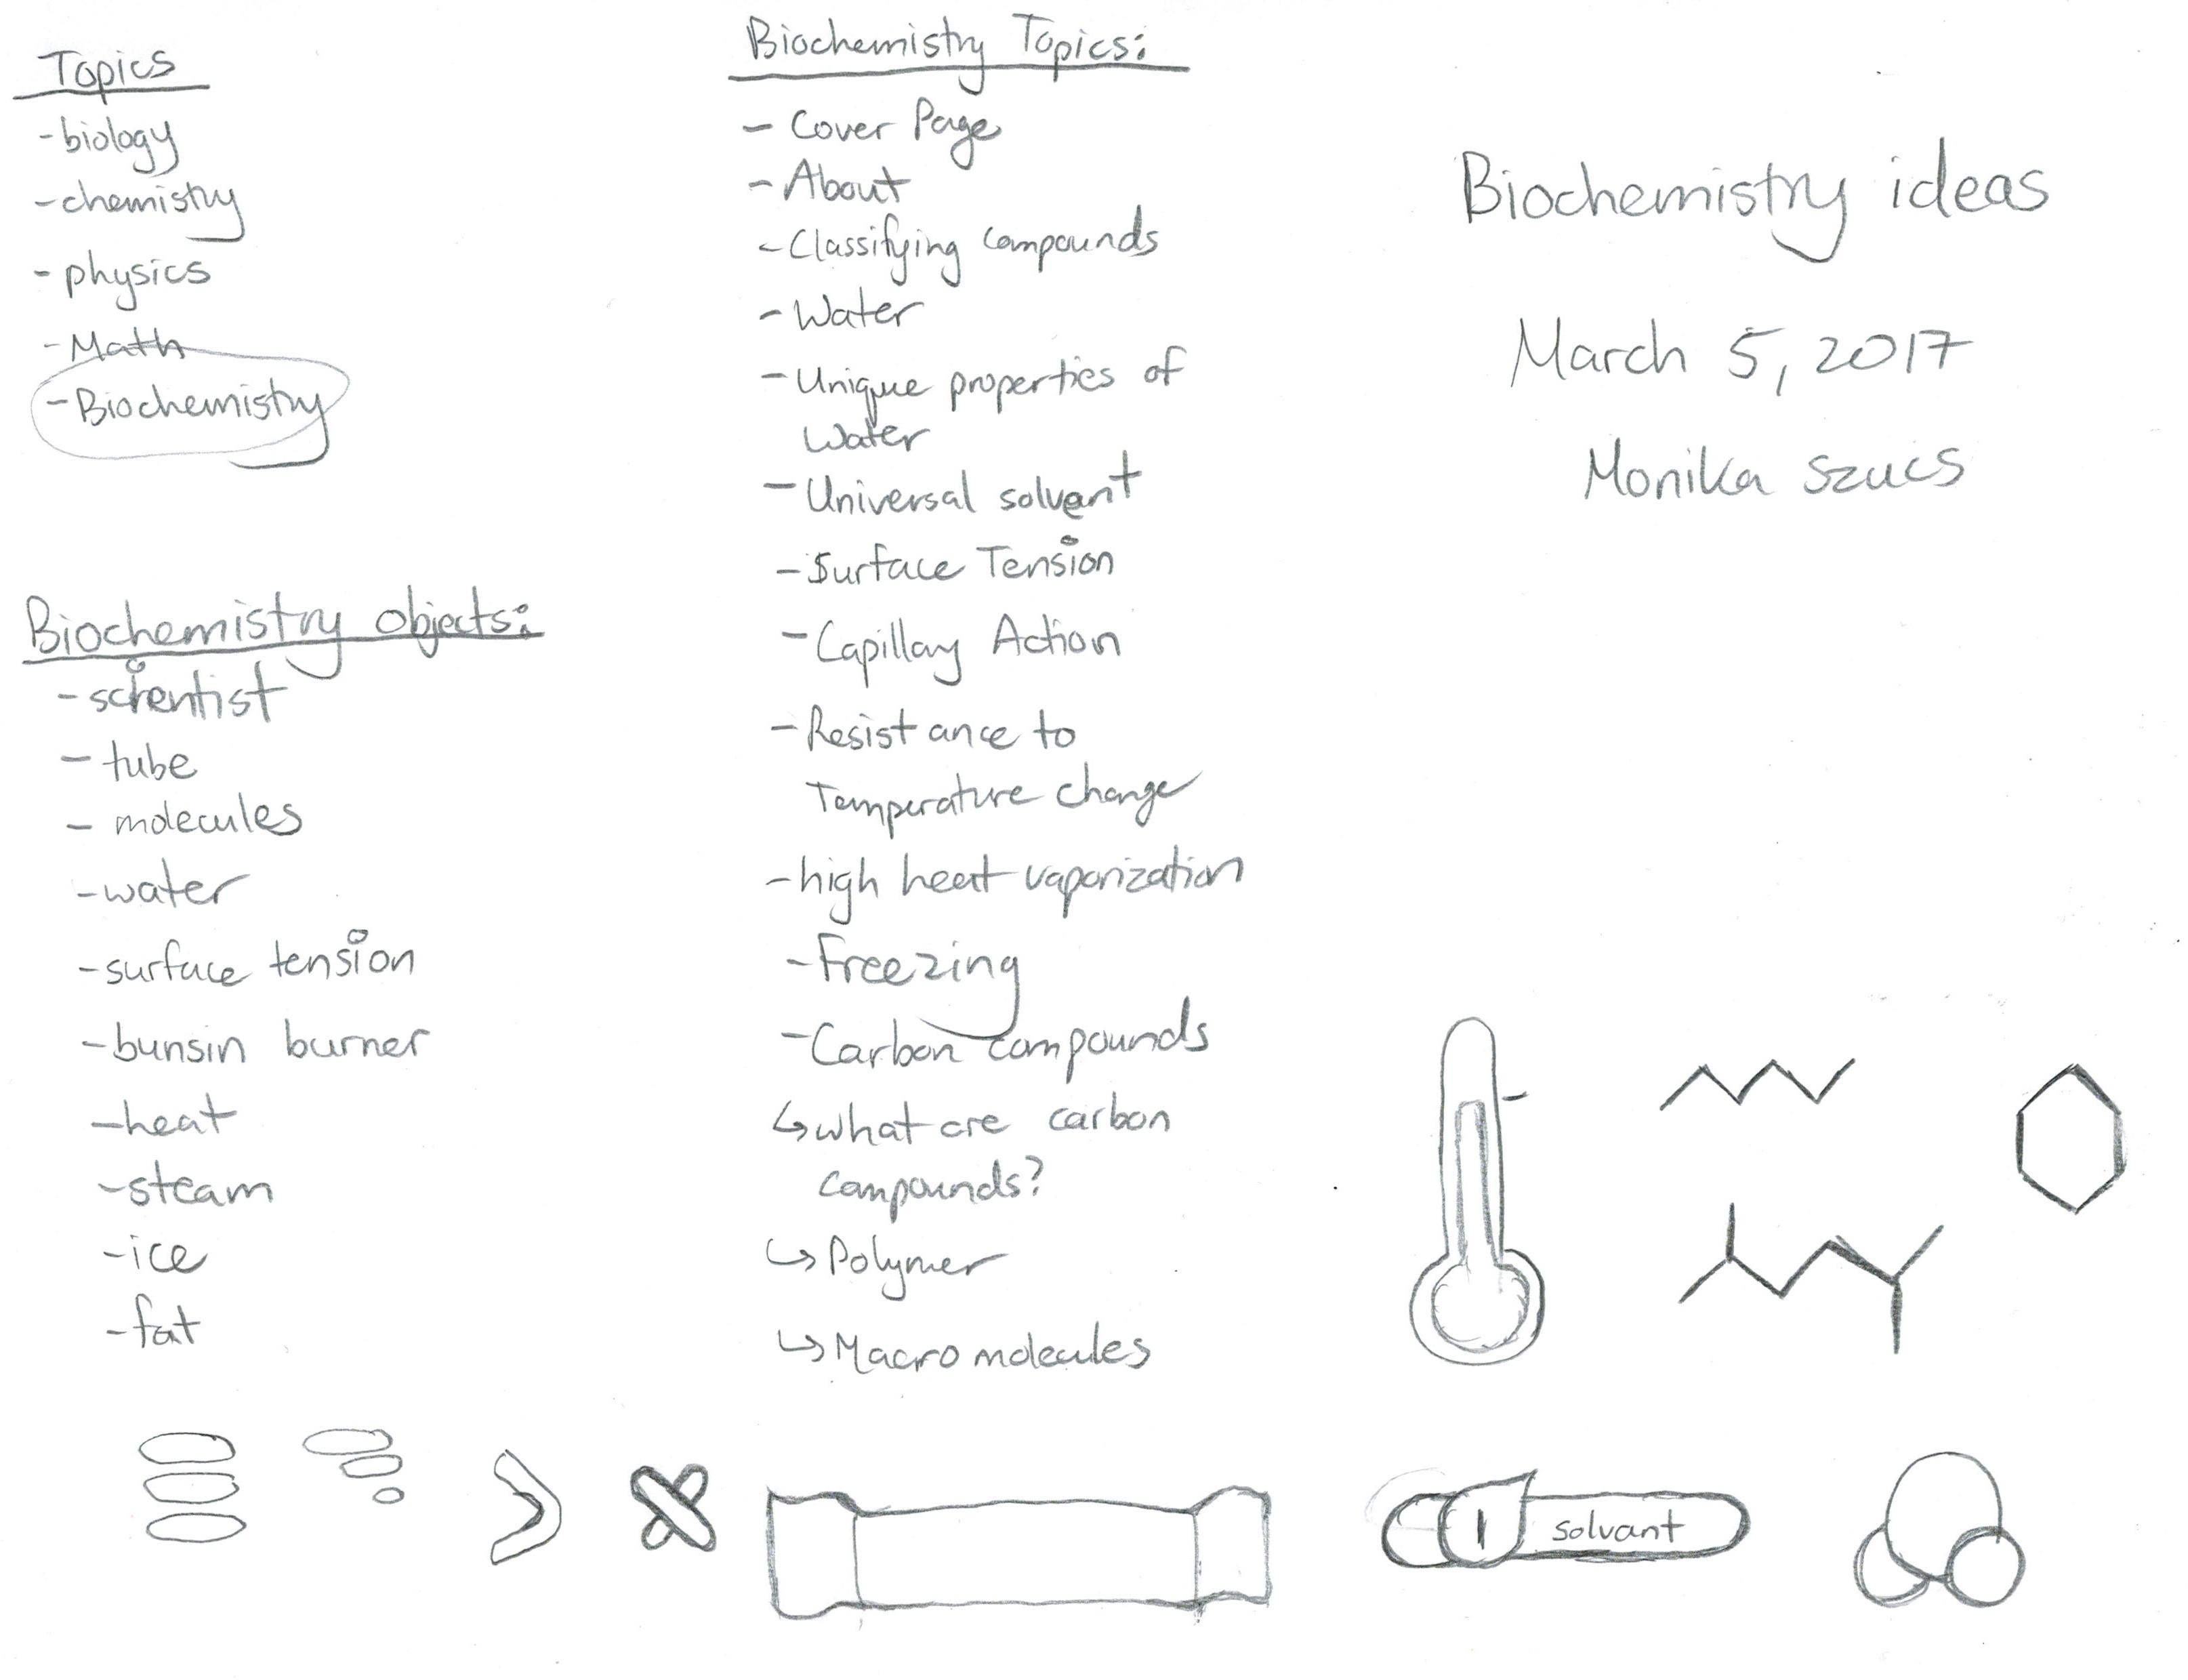 Biochemistry Study Guide created for students | Monika Szucs